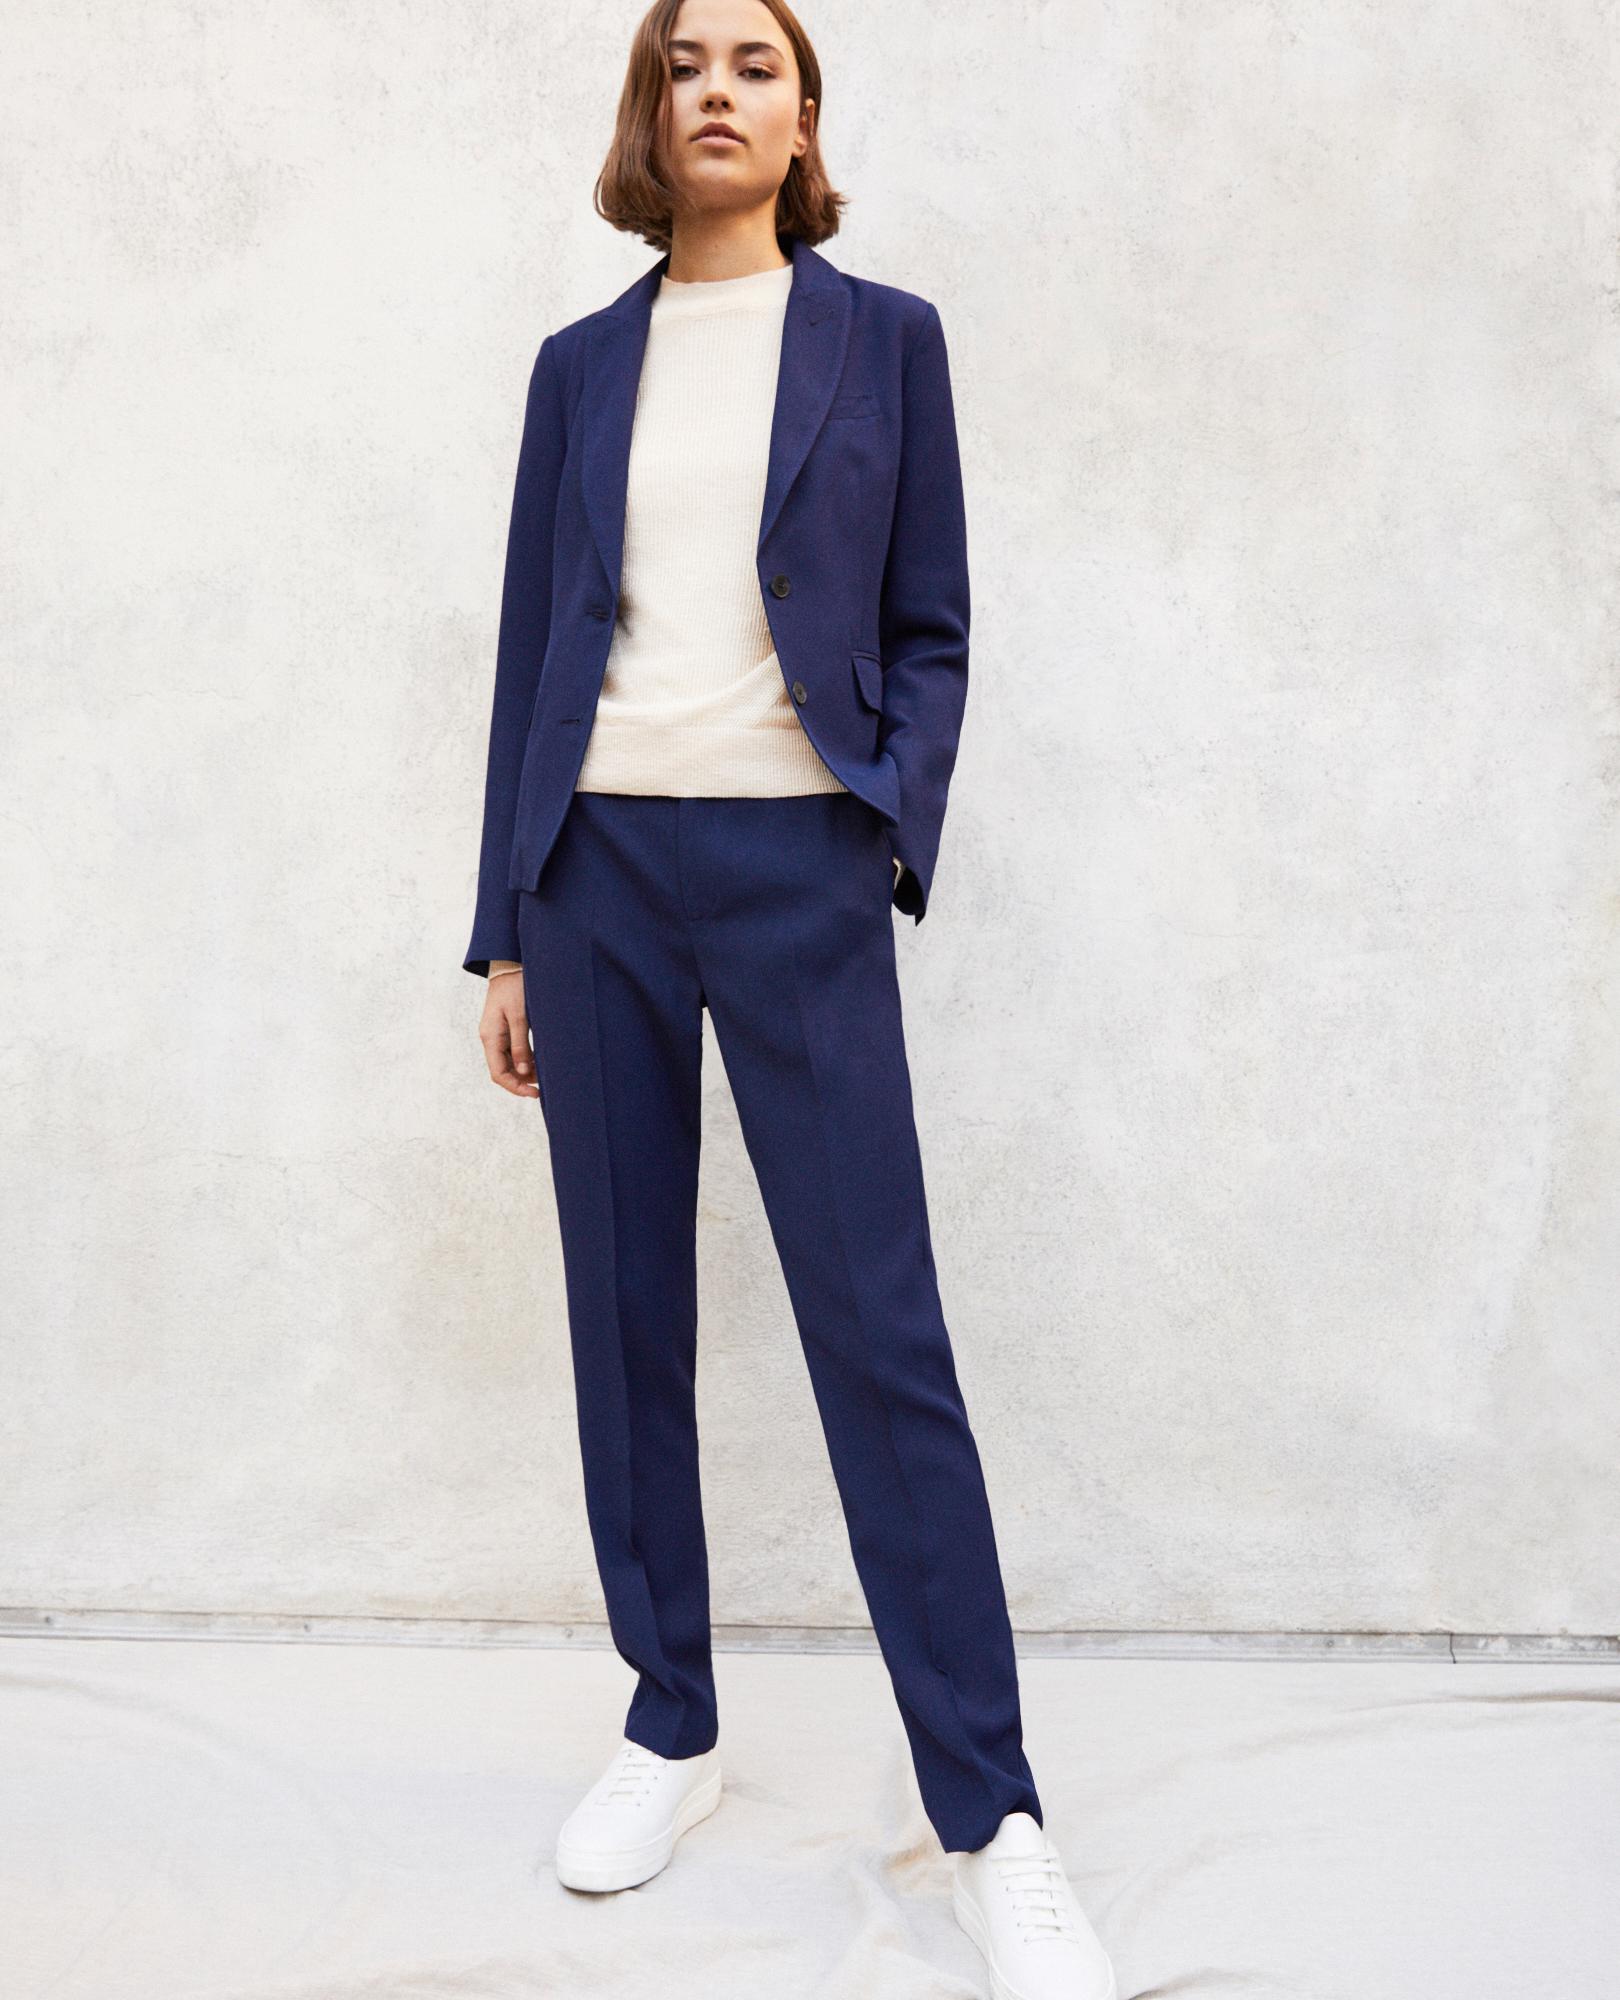 12c02bb1e19 Pantalon femme - Chino   Combinaison à la mode